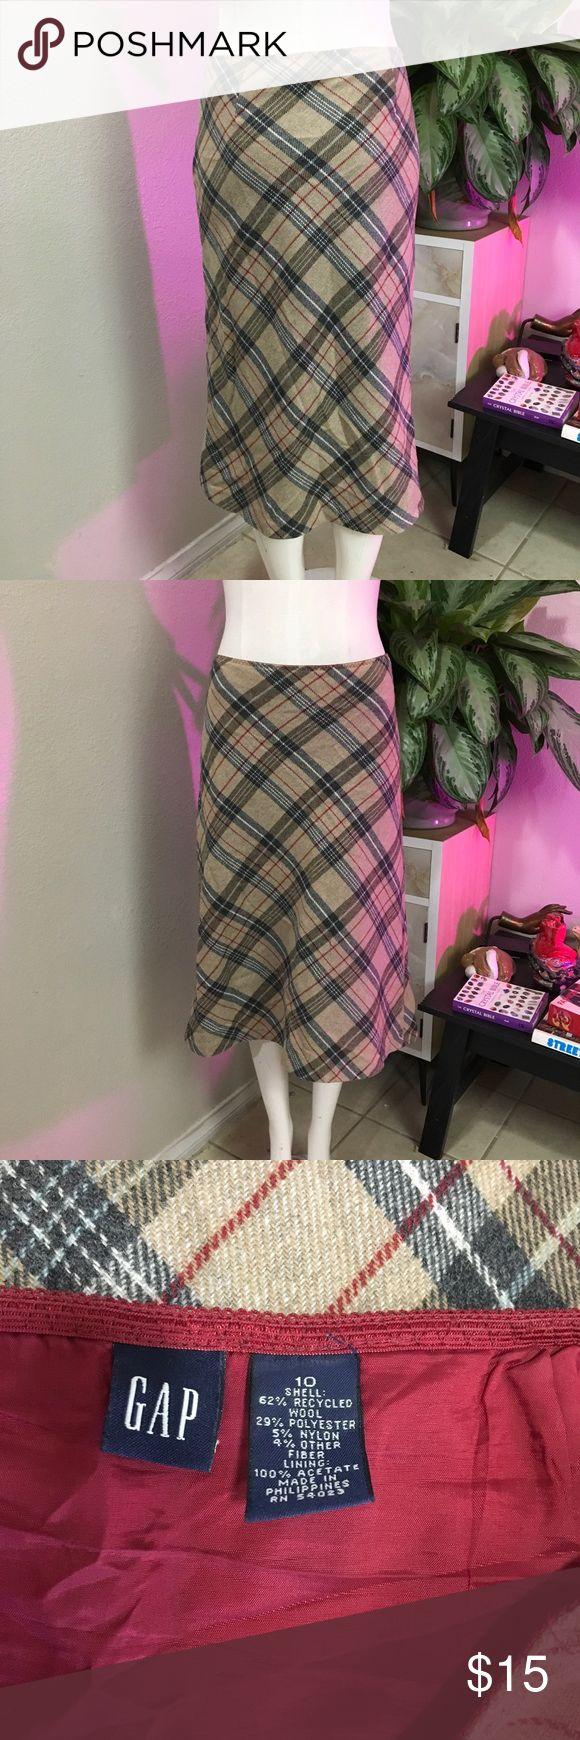 GAP PLAID CUTE WOOL SKIRT SZ L or 10 Cute wool skirt by GAP GAP Skirts